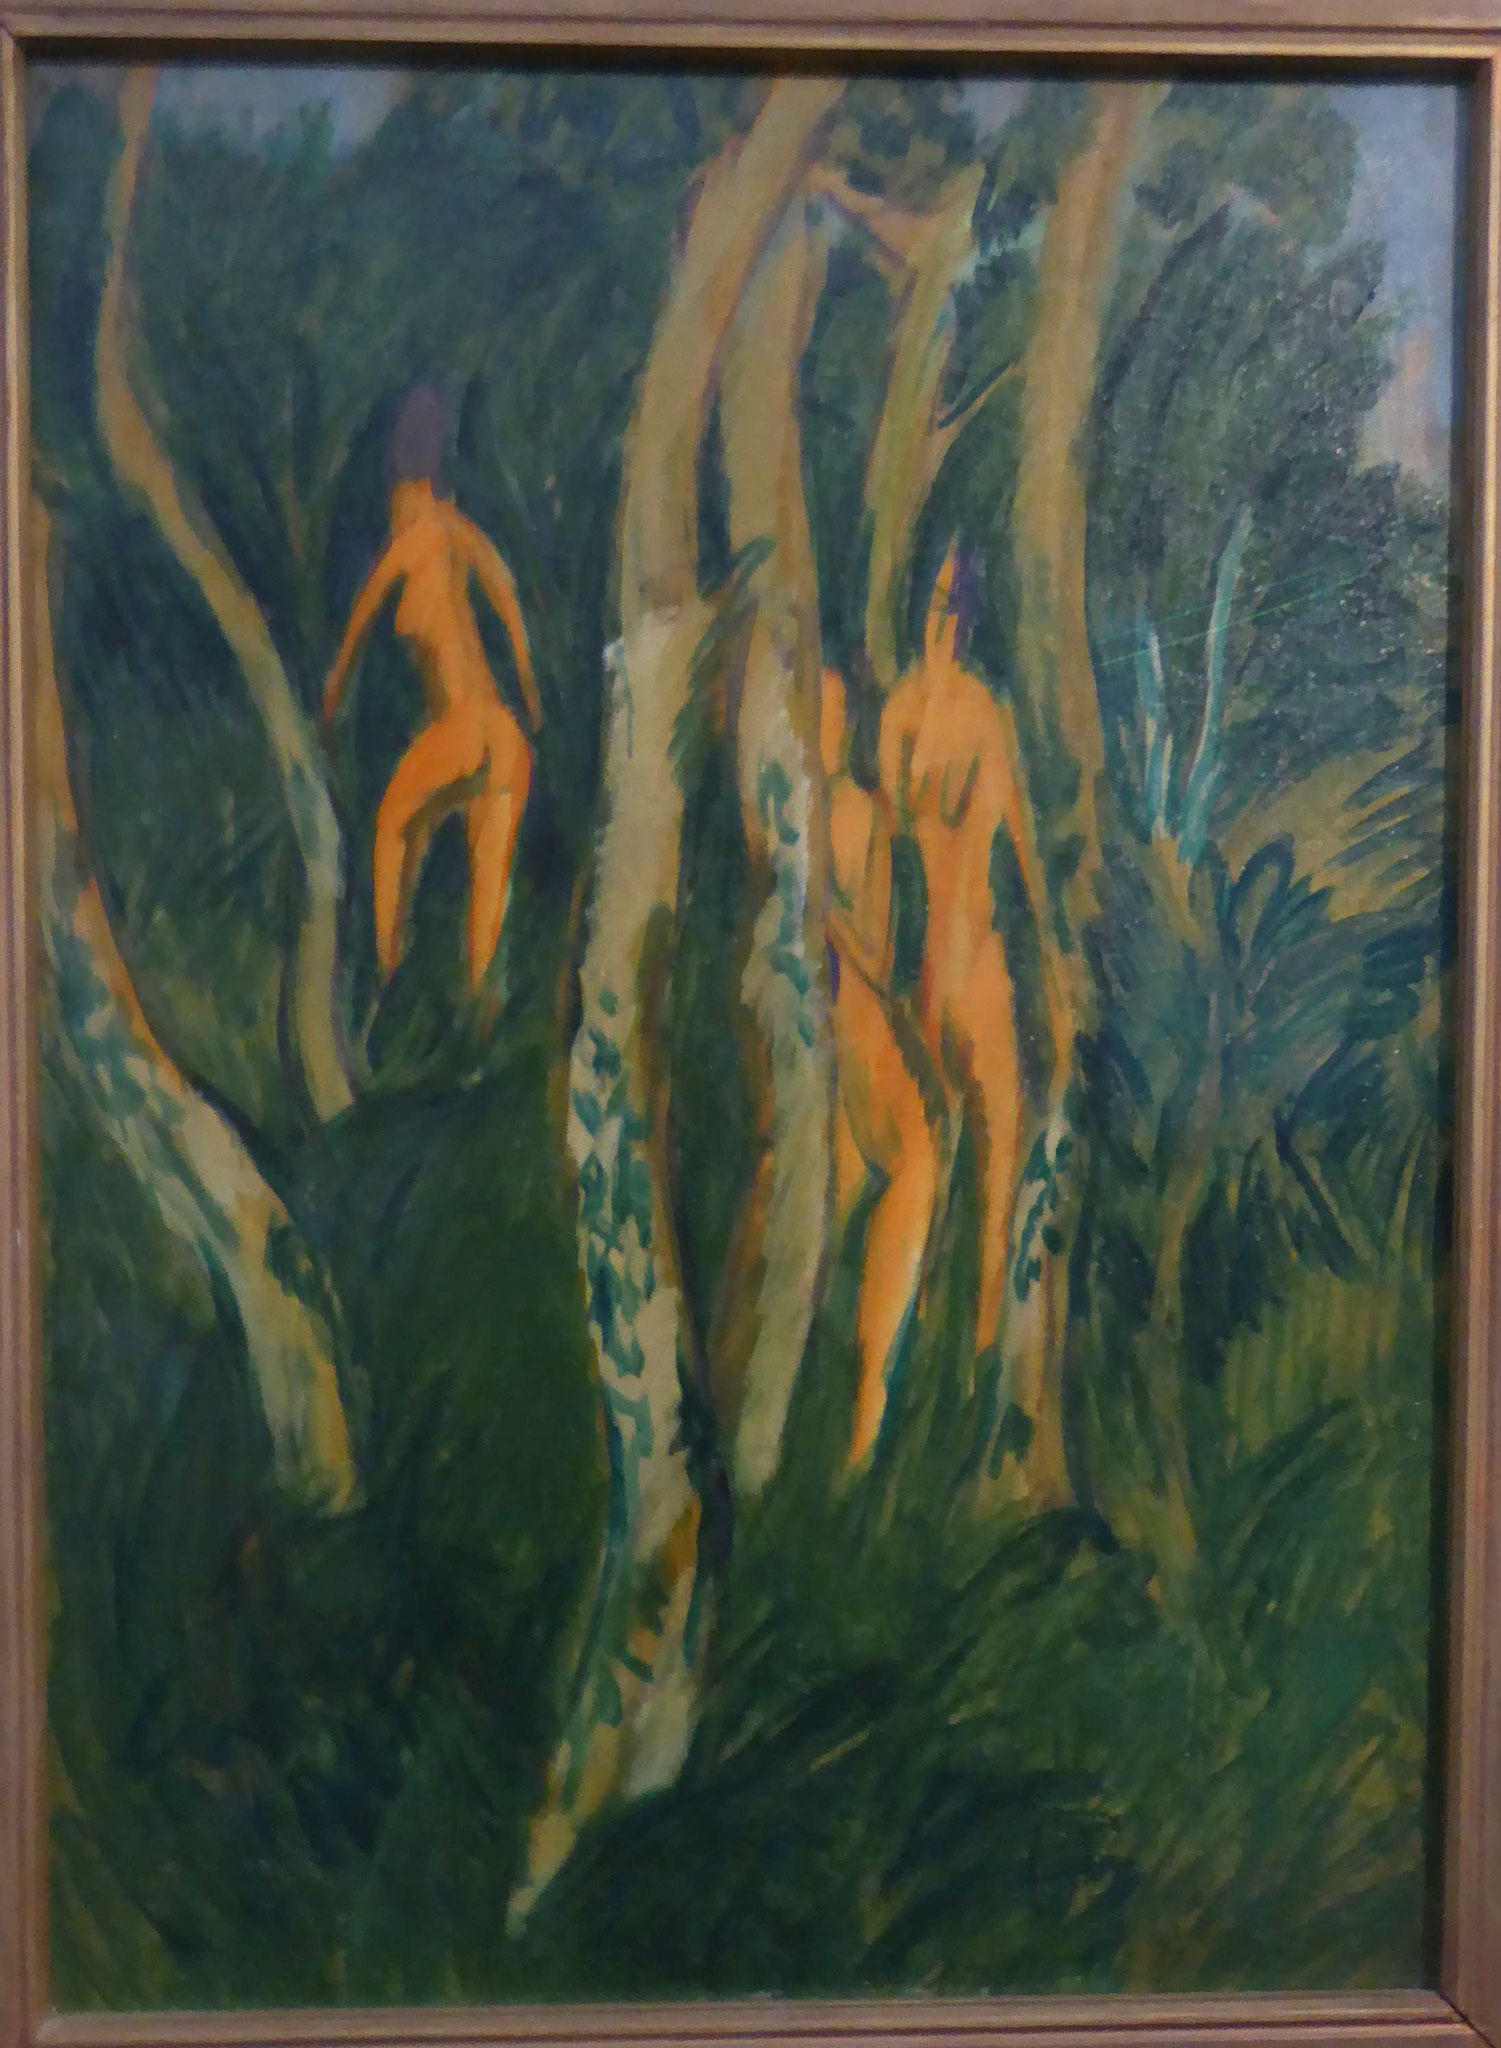 Ernst-Ludwig Kirchner, Akte im Strandwald, 1913,  Museum Moritzburg, Halle